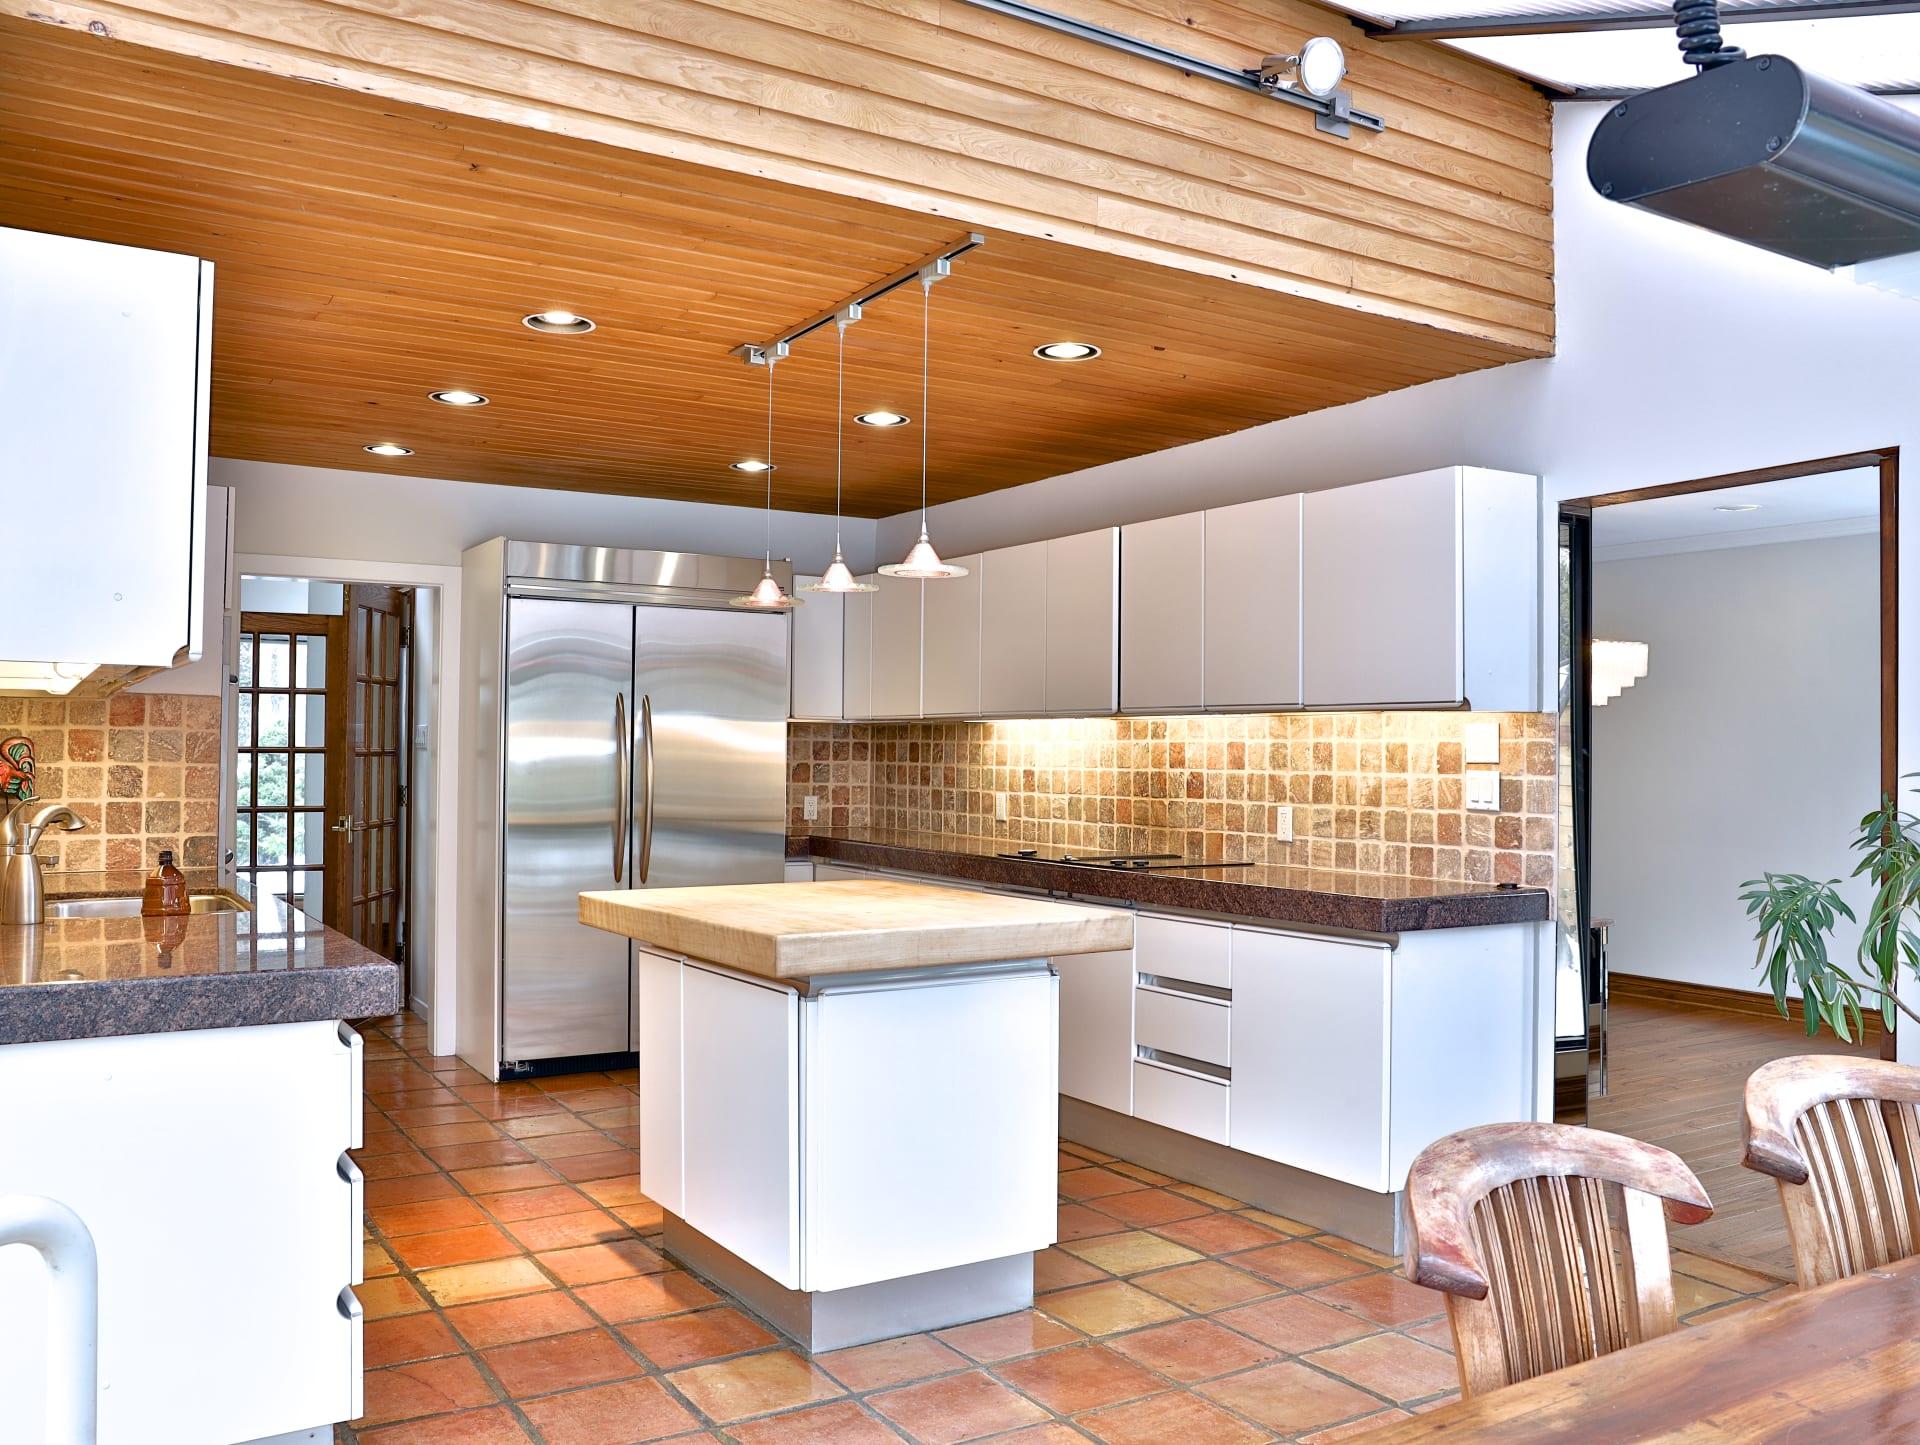 Home For Lease In Prestigious St. Andrews